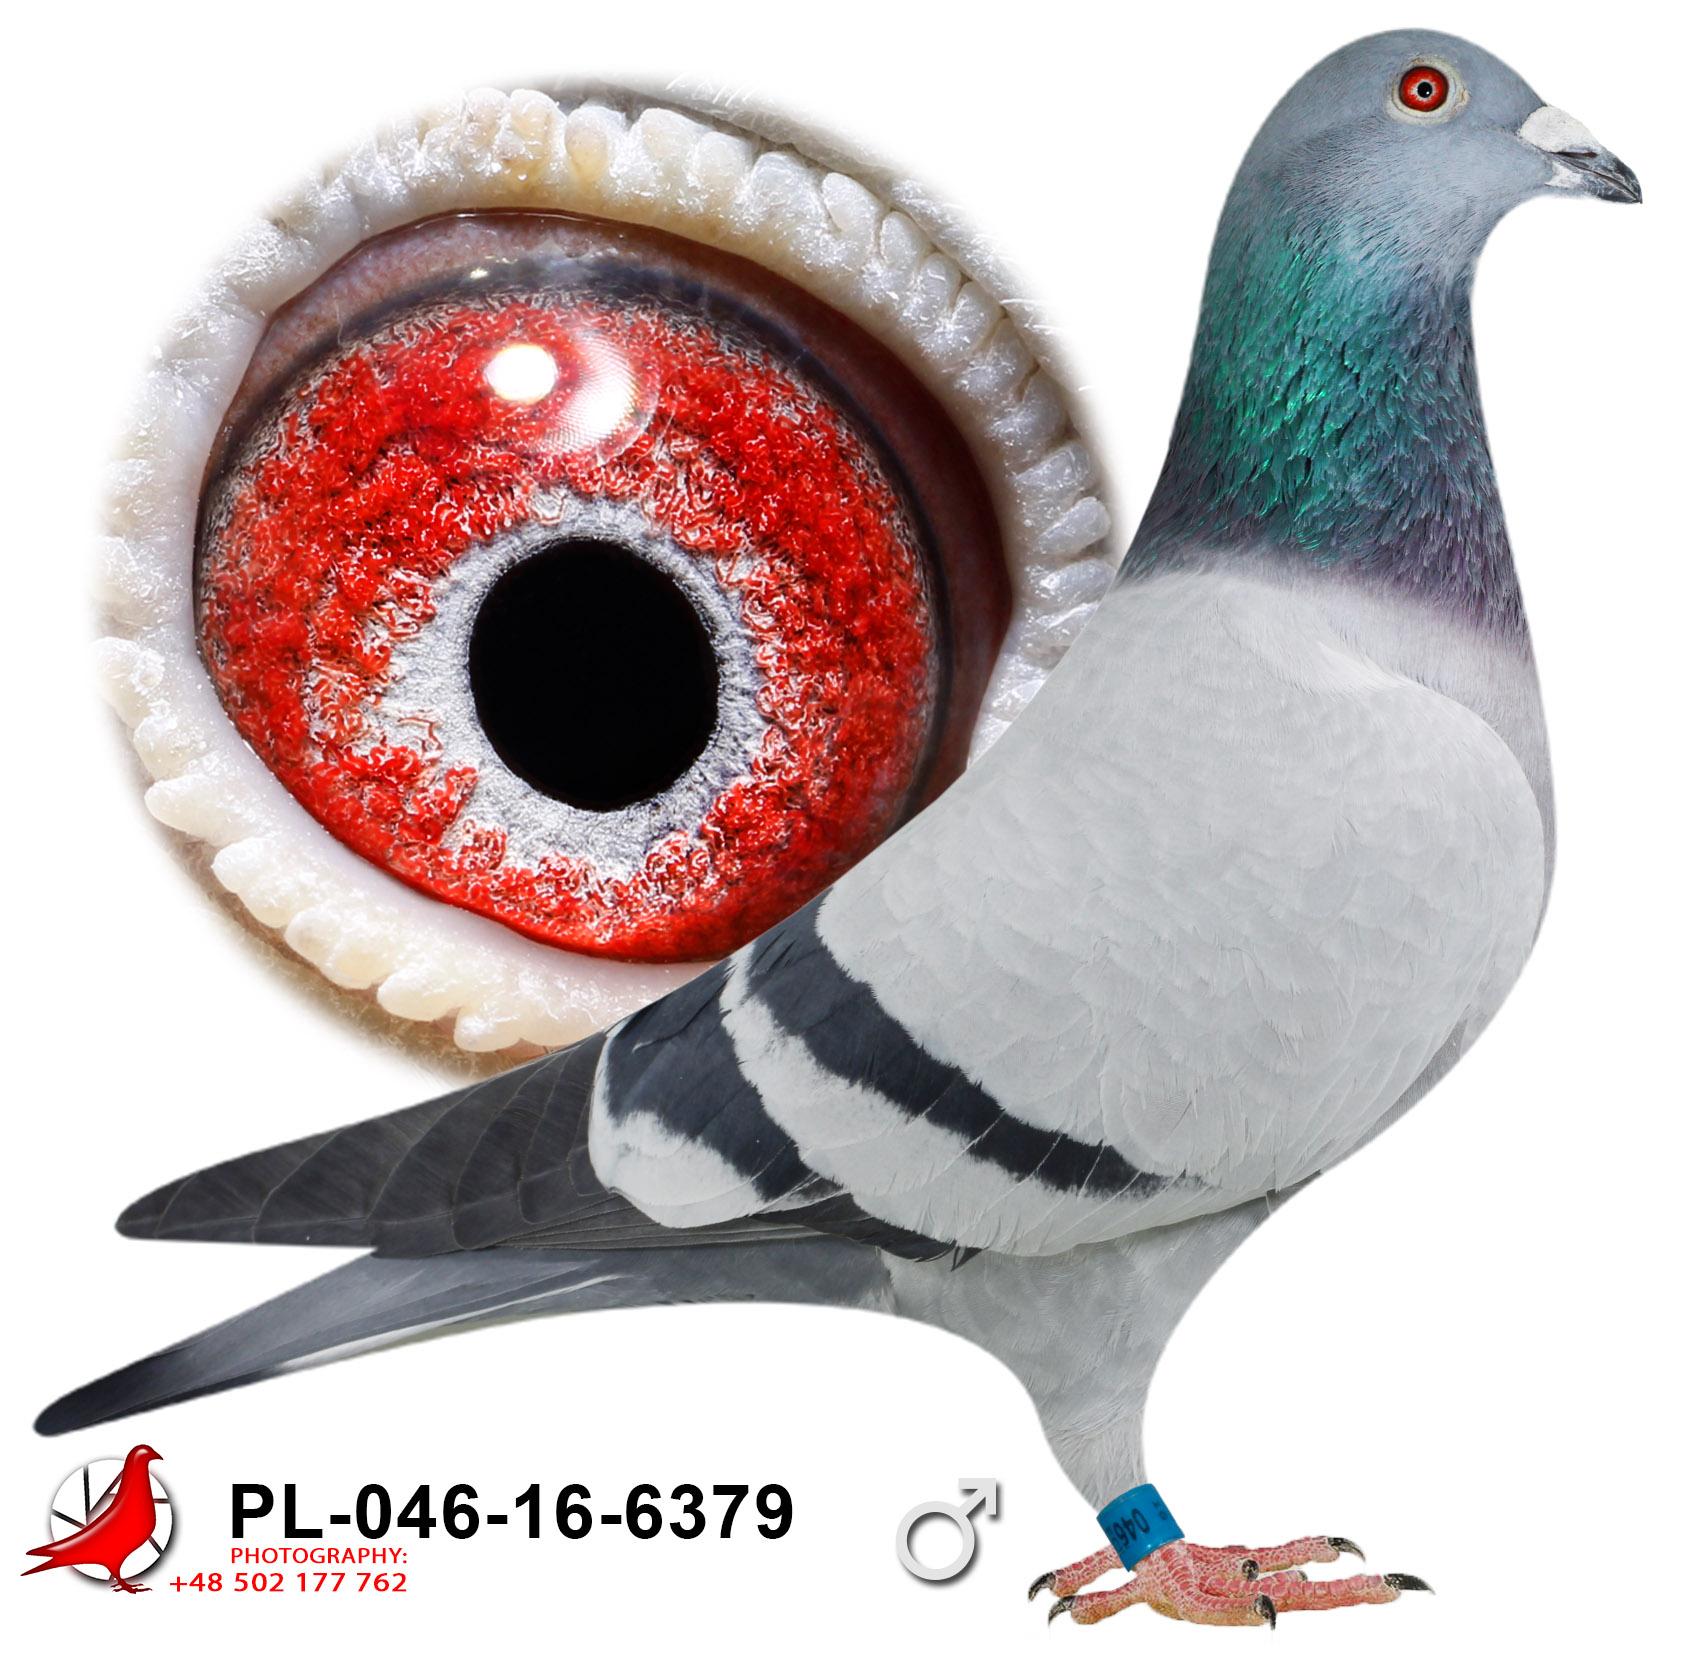 pl-046-16-6379_c